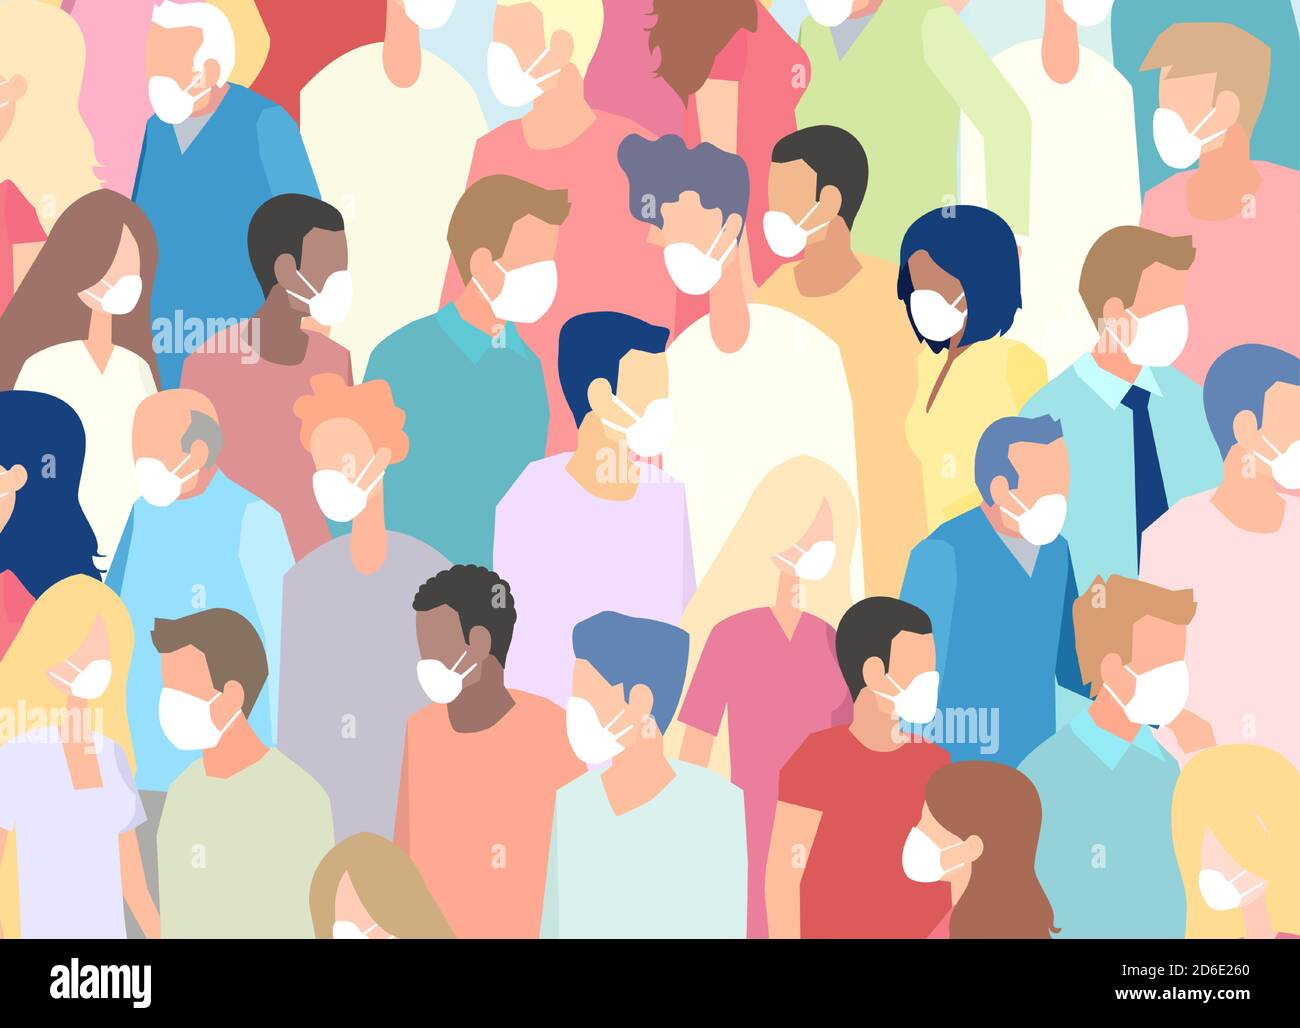 Crowded #11B VF 2020 Stock Image